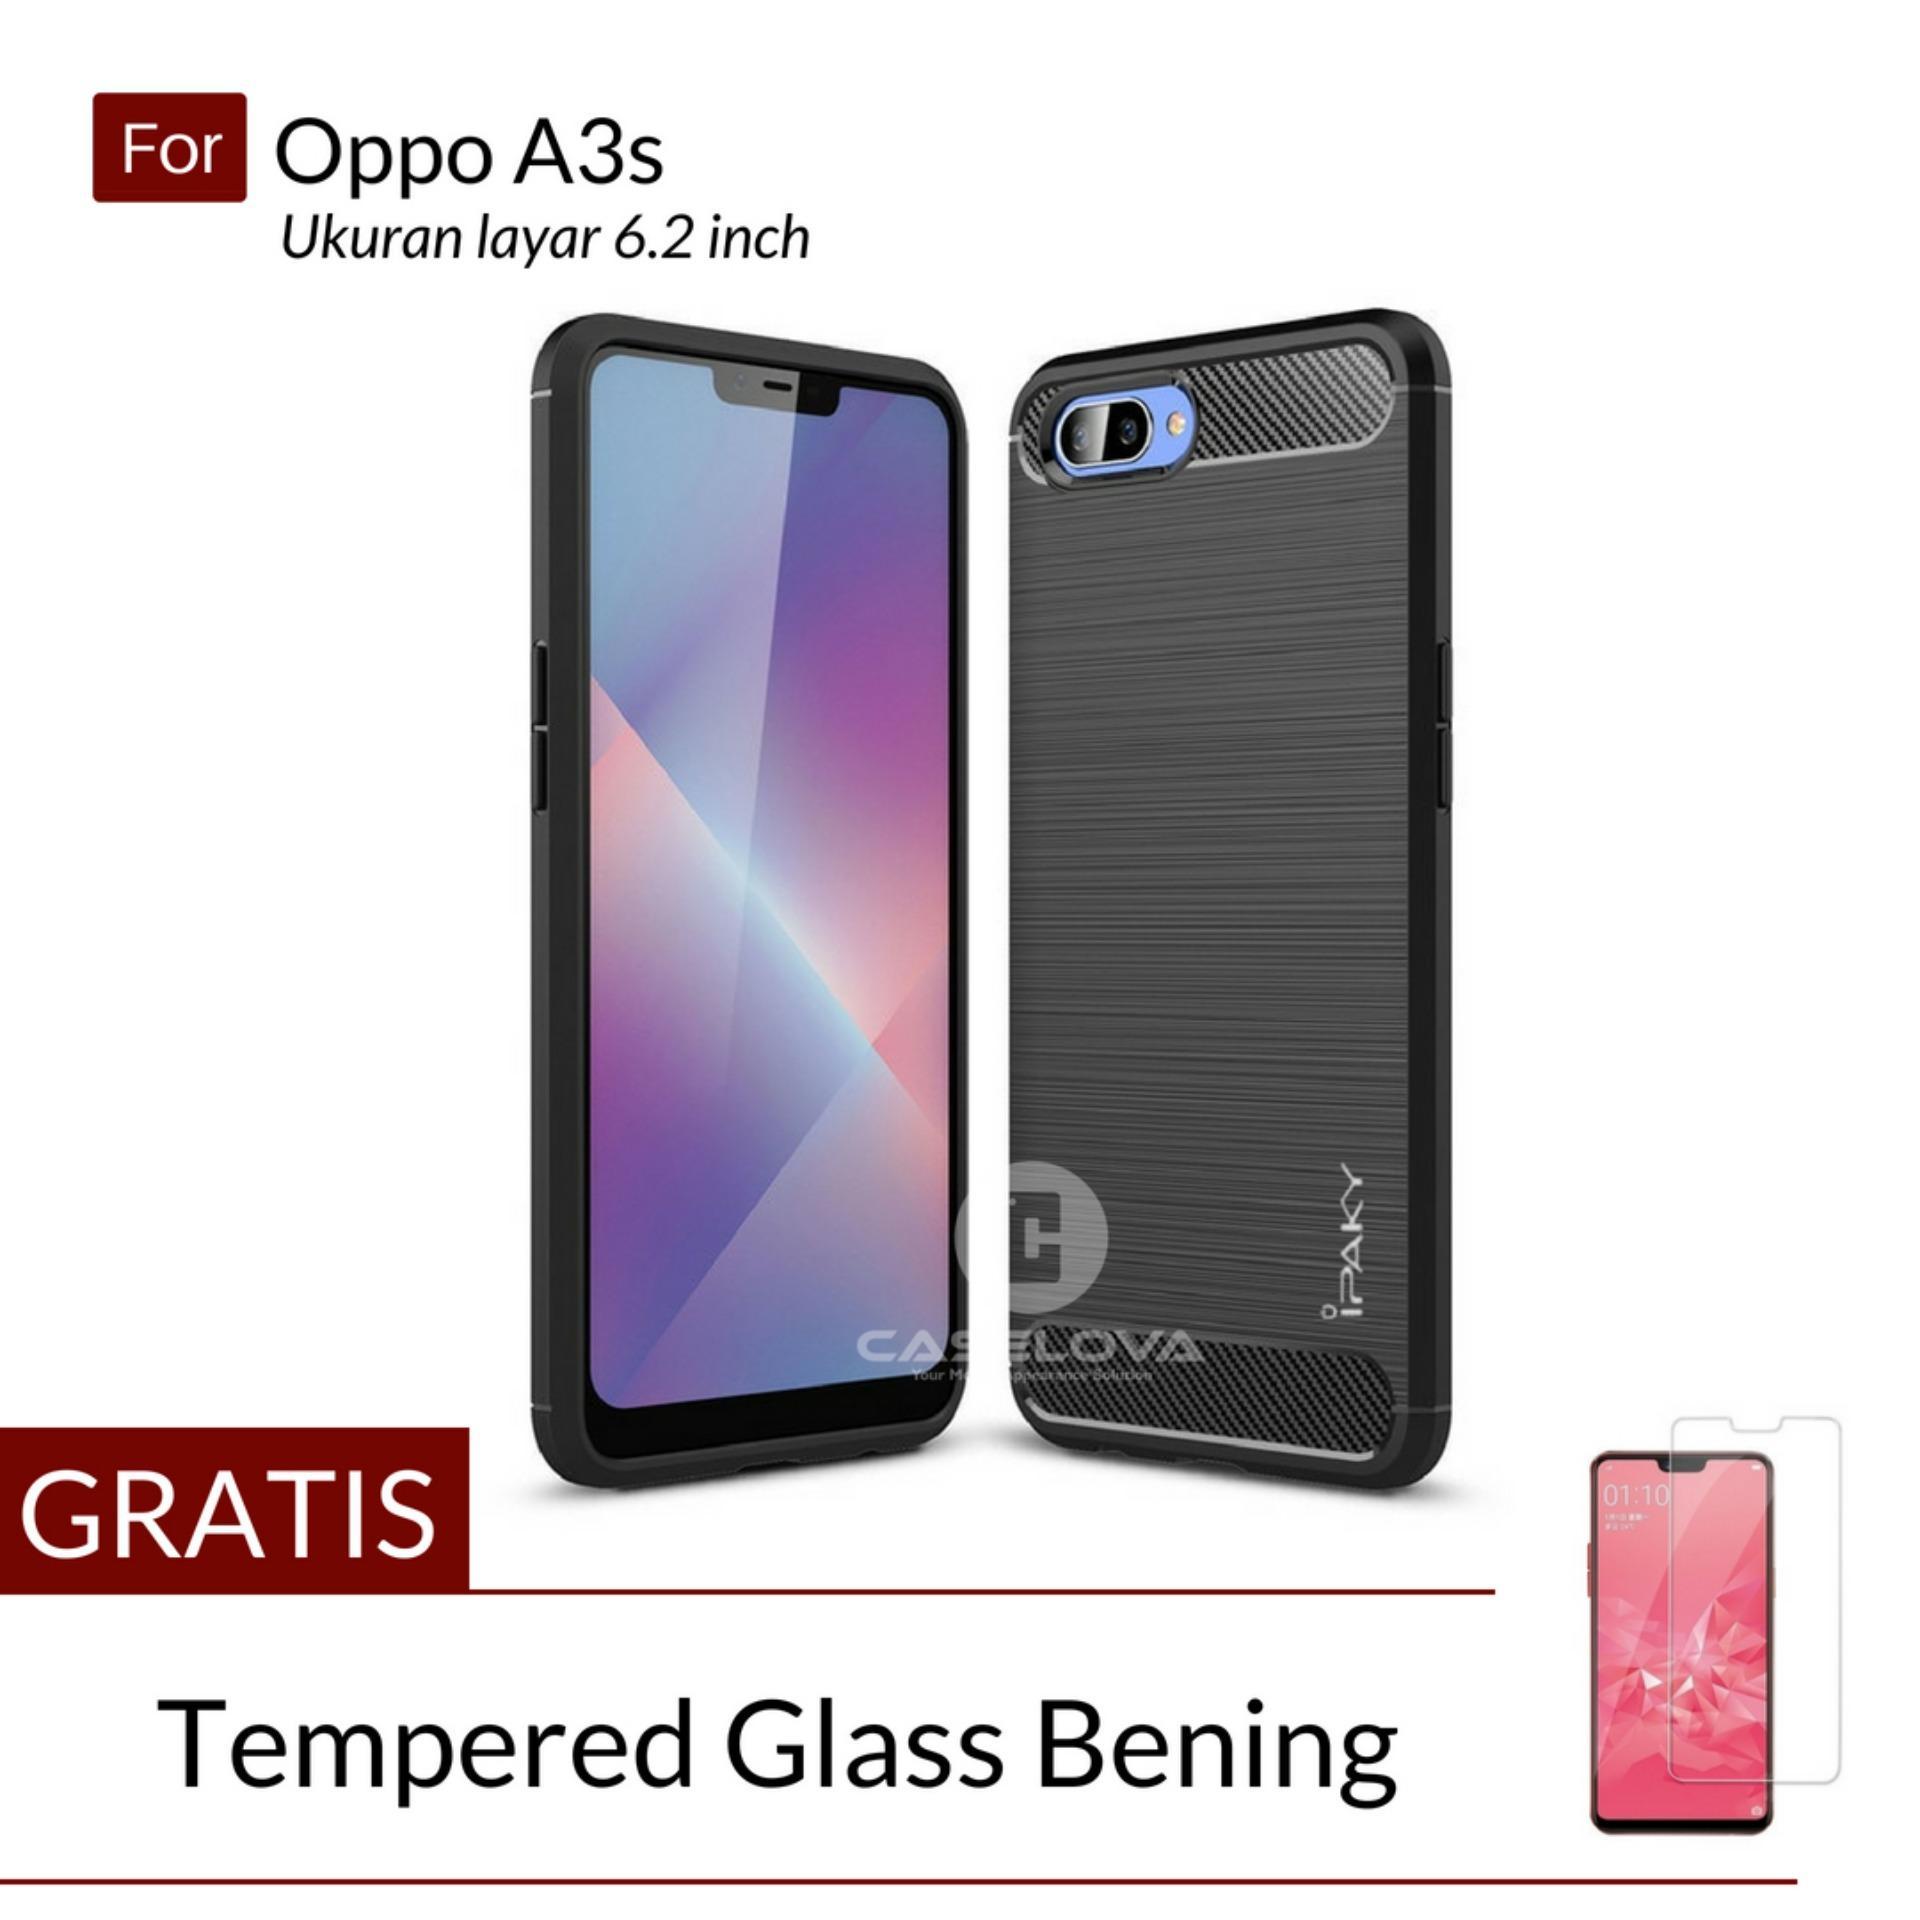 Caselova Premium Quality Carbon Shockproof Hybrid Case for Oppo A37 / A37f / Neo 9 ( sama ukuran ) - Black + Gratis Tempered GlassIDR27550. Rp 27.550